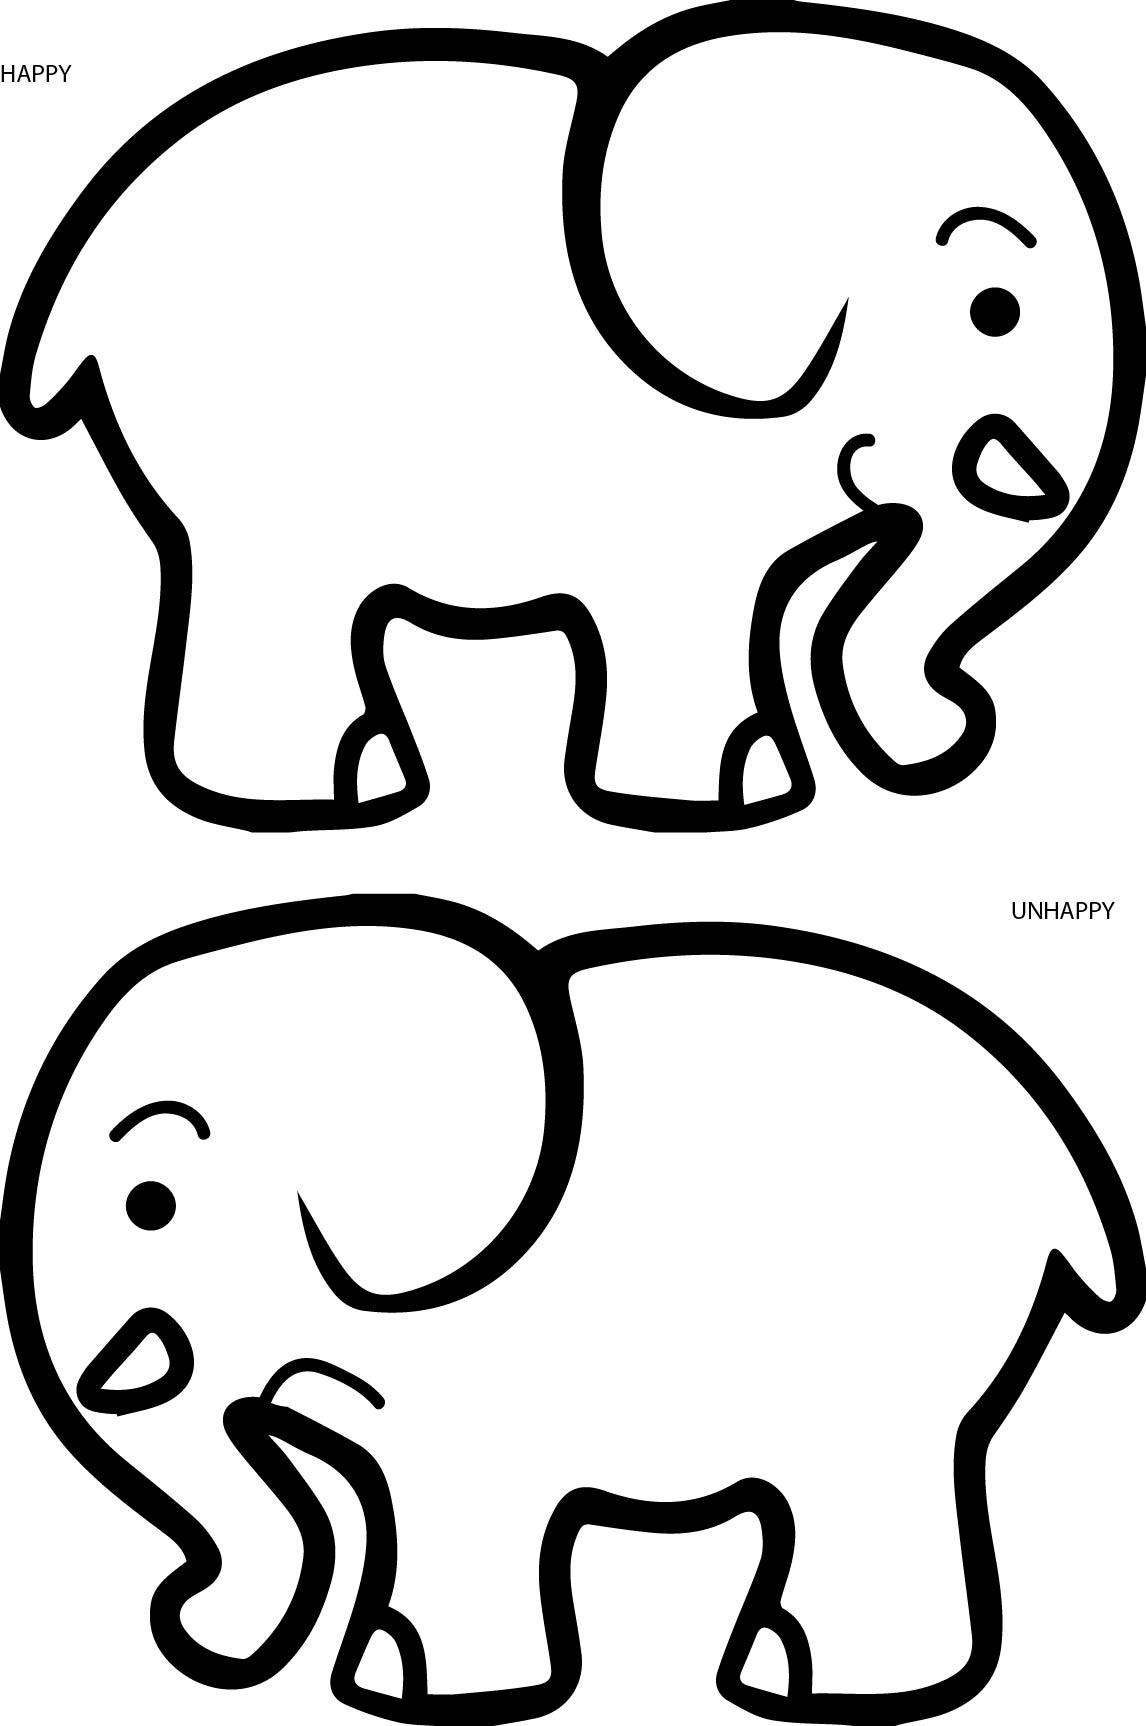 Happy Unhappy Elephant Coloring Page